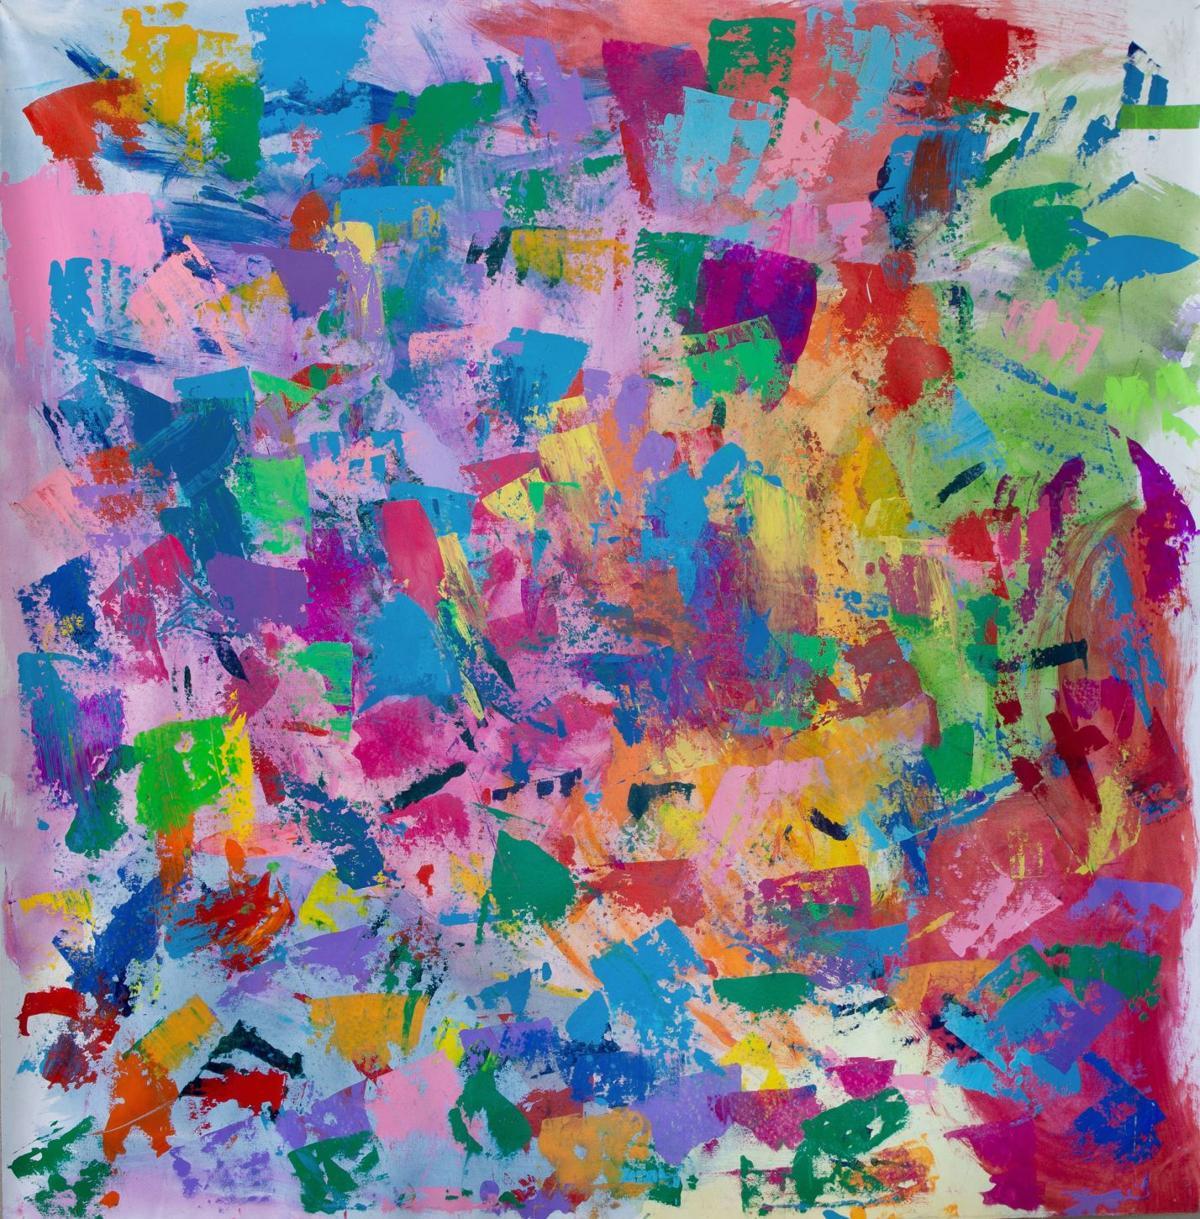 101619_MNS_autistic_artist_002 Beautiful as Me